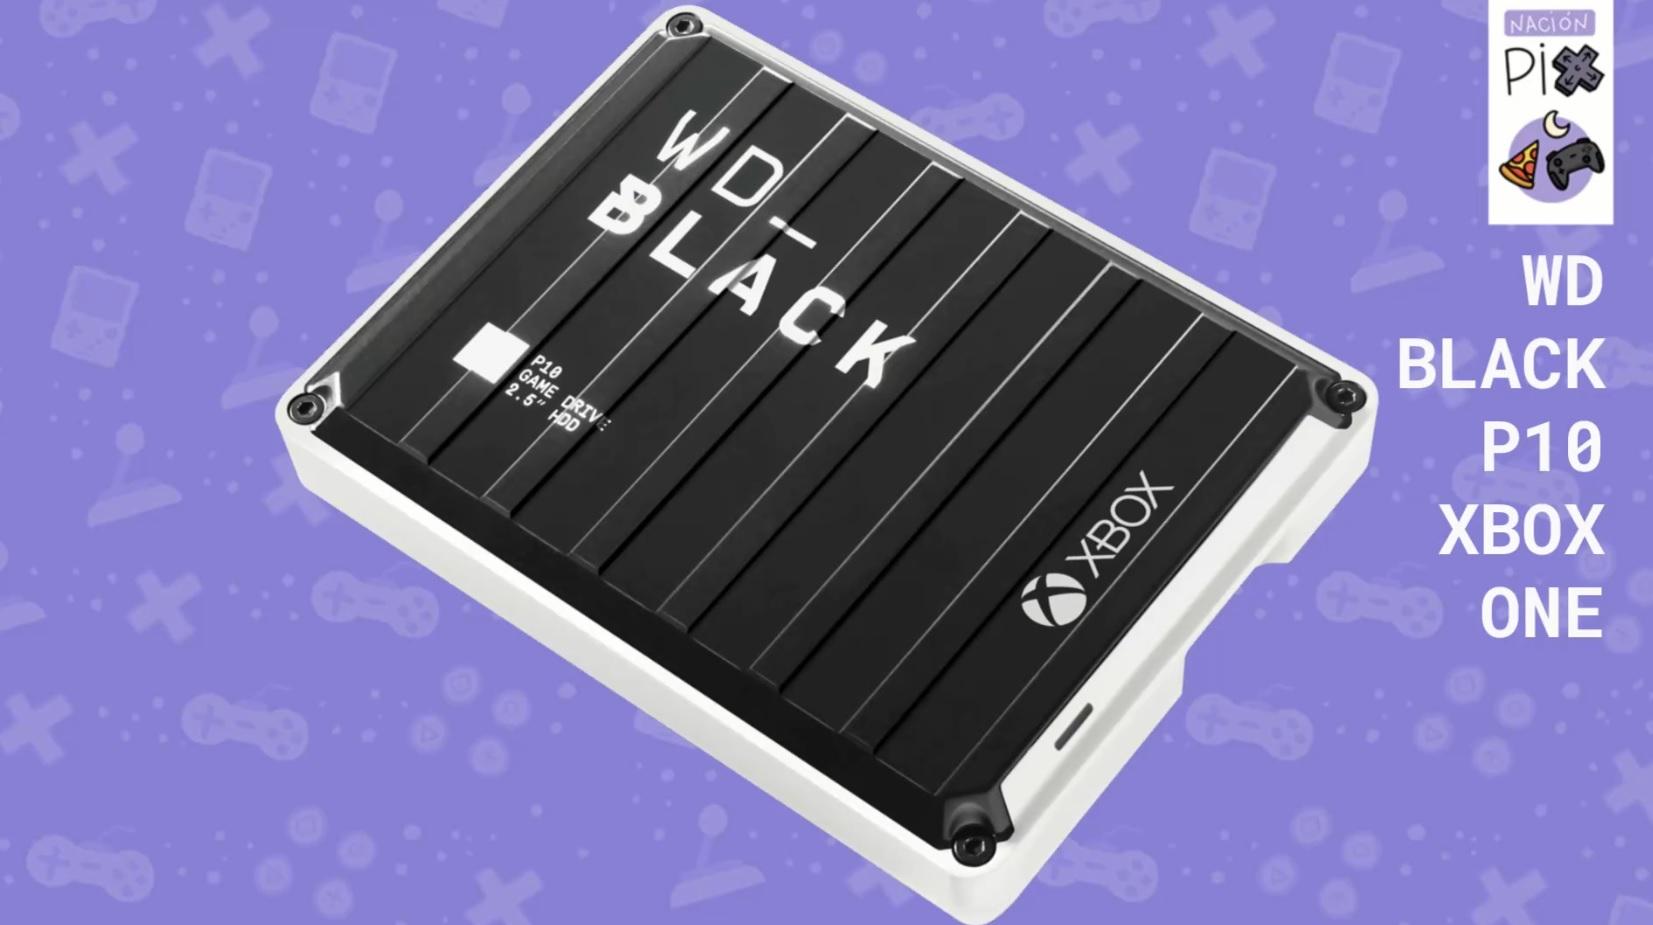 WD Black P10 Xbox One